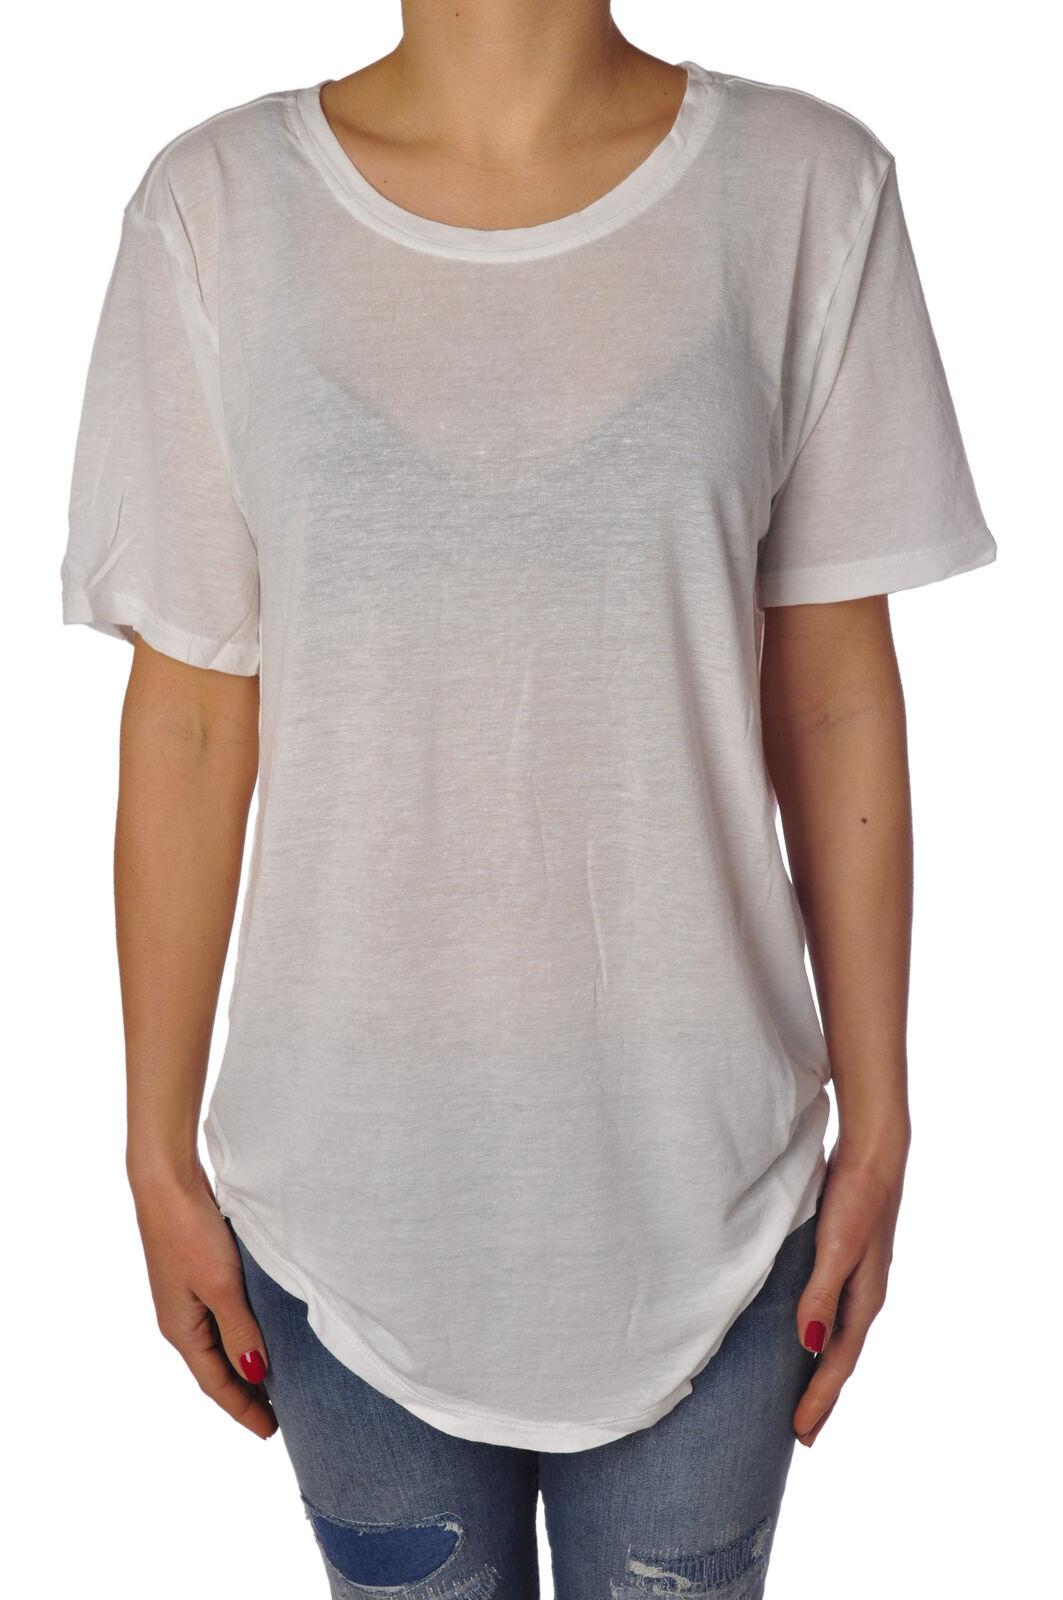 Soallure - Topwear-T-shirts - frau - 773417C184000